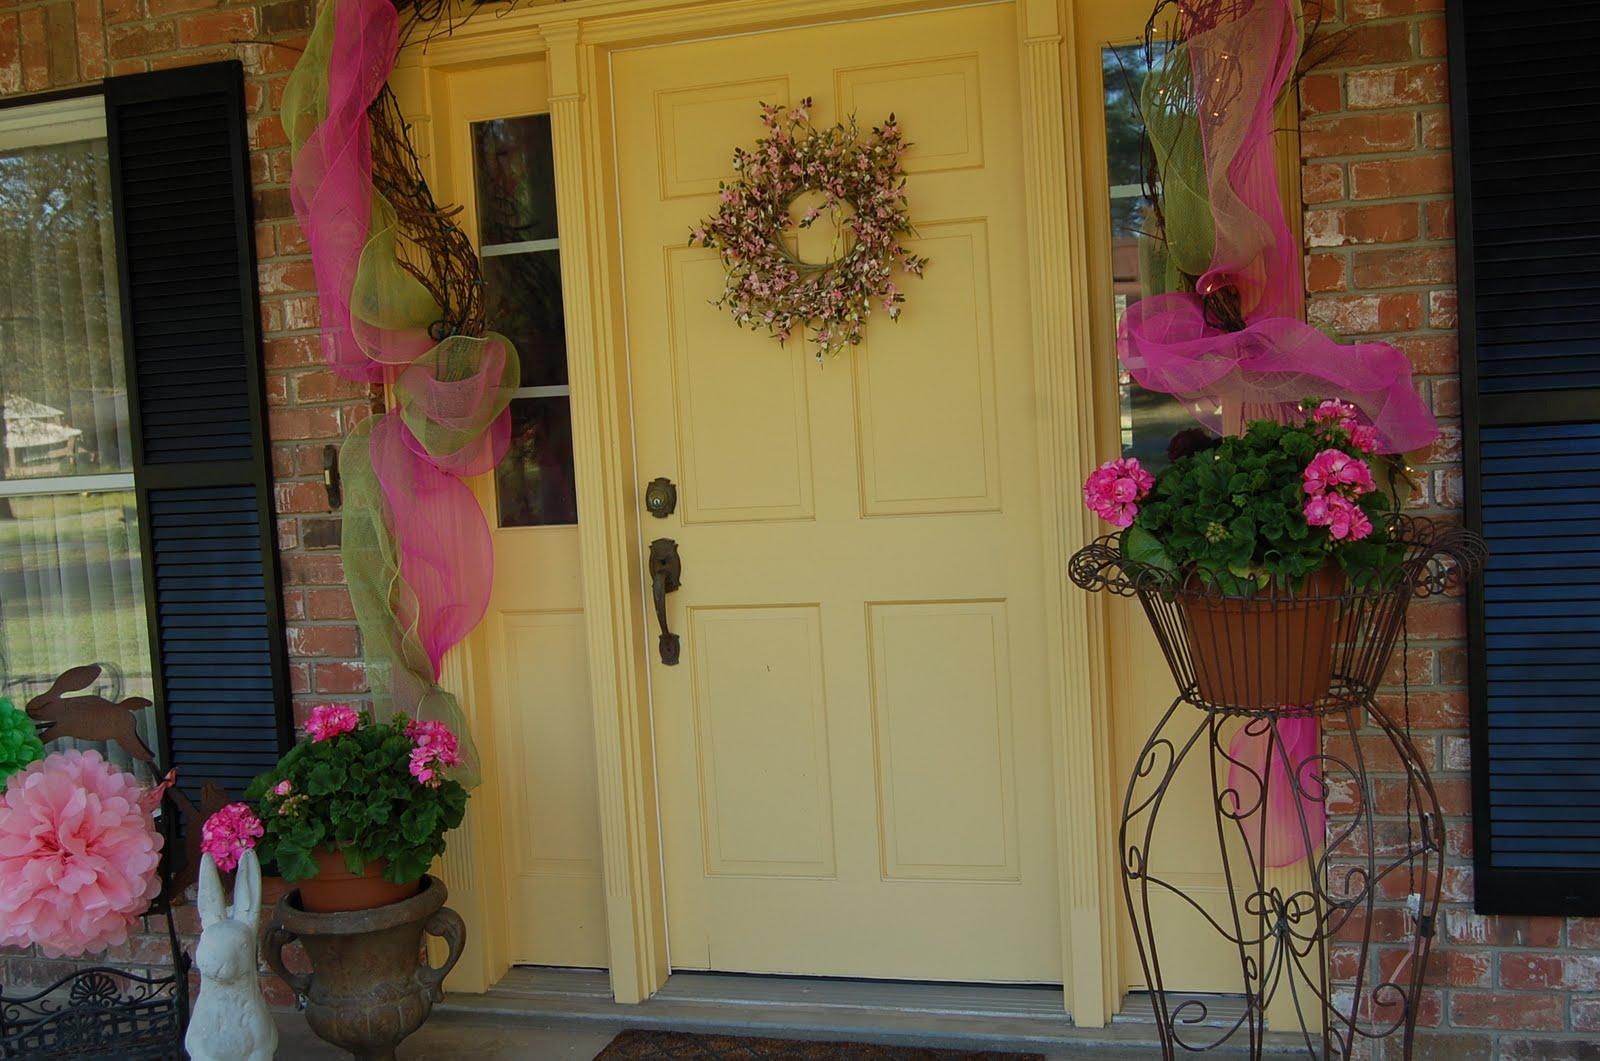 Marvelous Easter Front Door Decorations Ideas - Exterior ideas 3D ...